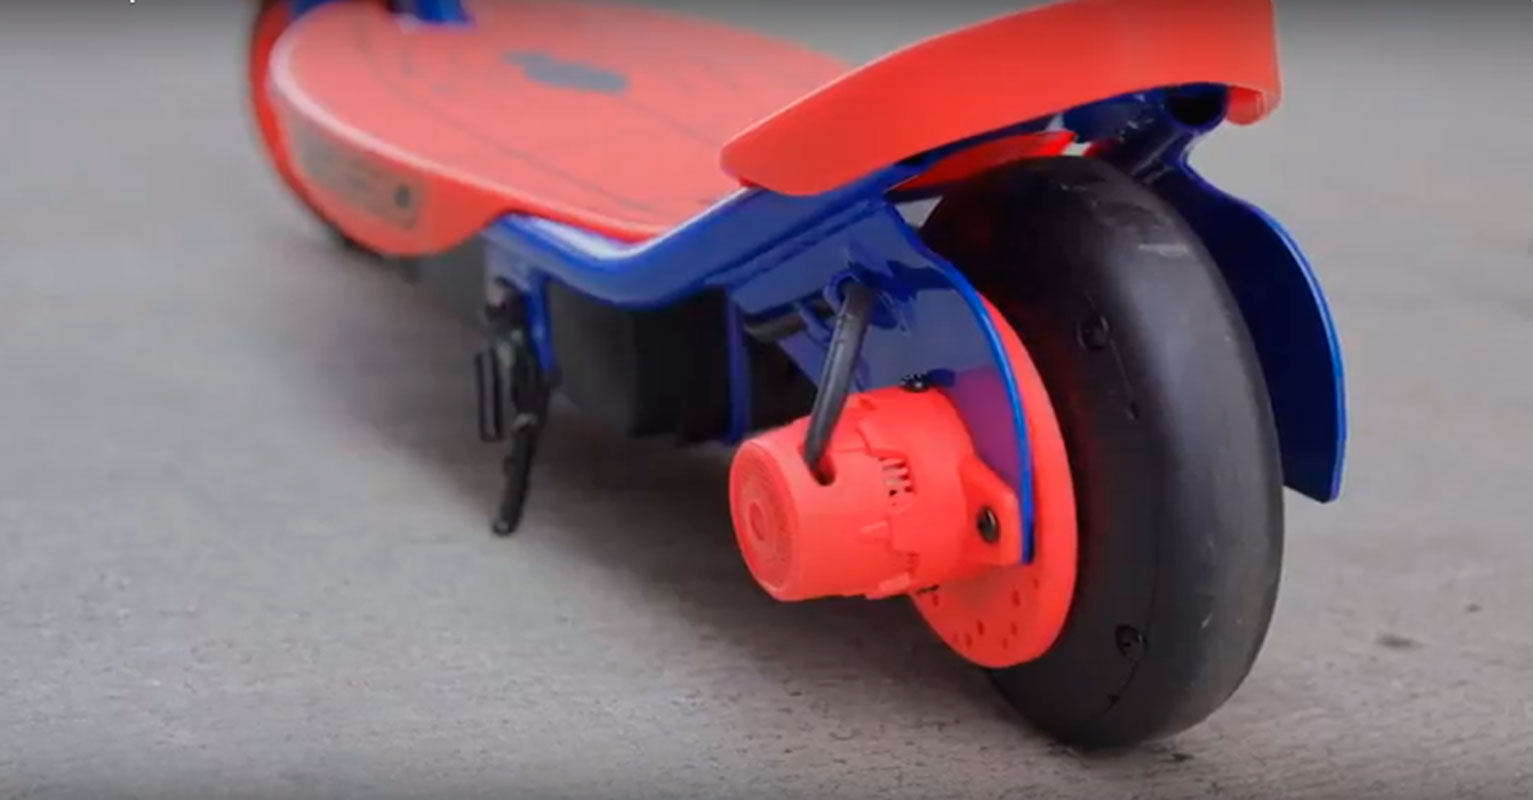 Razor Spider Man Power Core E90 Electric Scooter Gearscoot